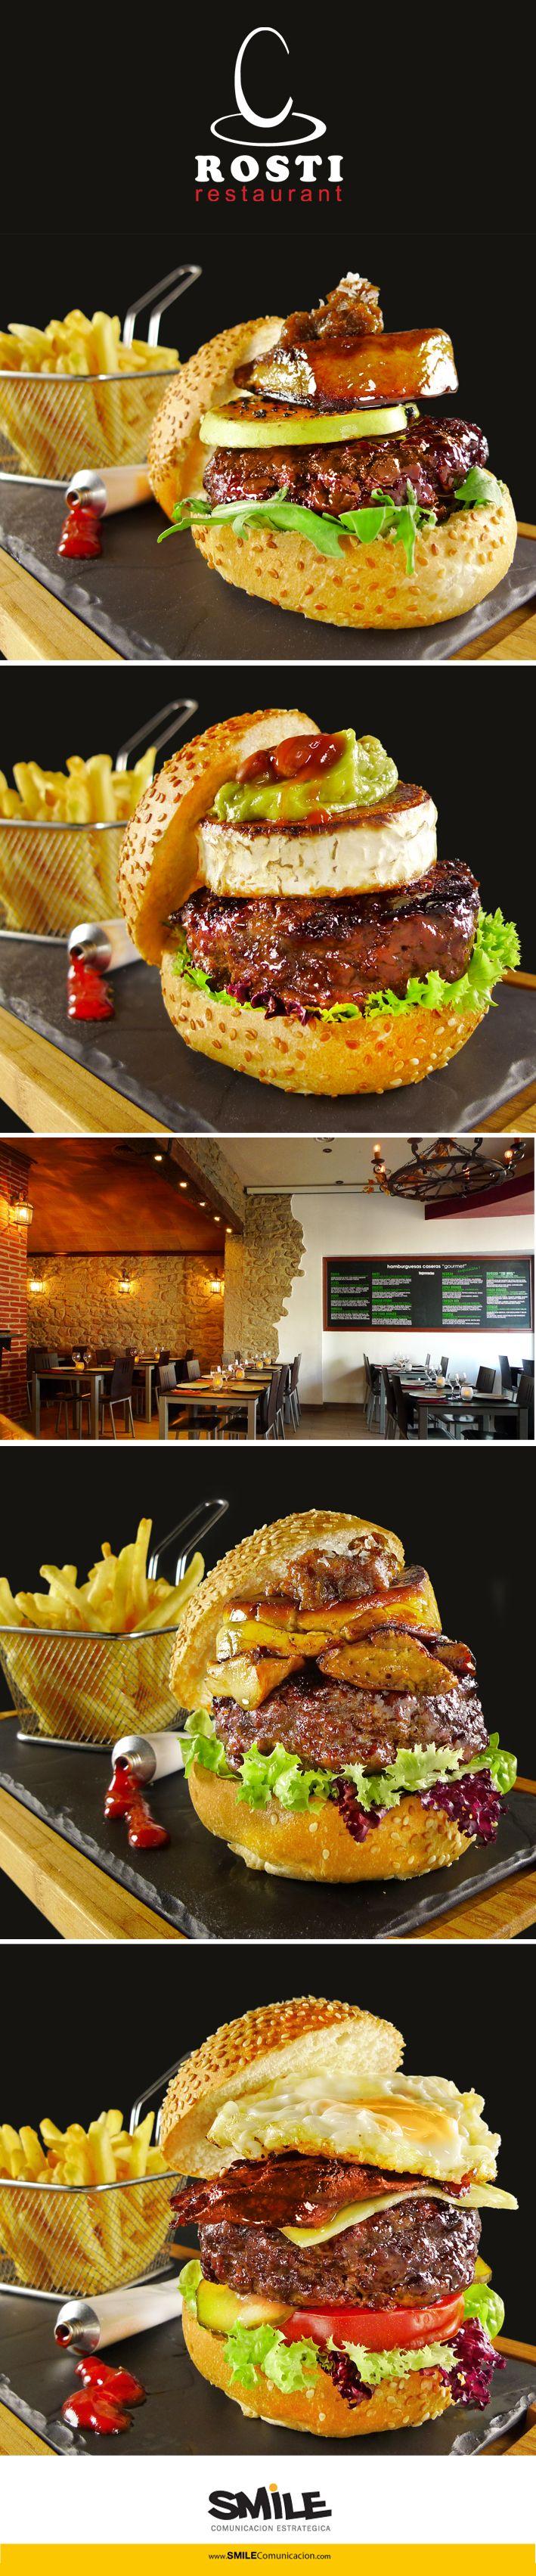 fotografia de hamburguesas caseras gpurmet | Homemade gourmet burger restaurant. Cliente: Rosti restaurant. Fecha: 2013. www.rosti.cat